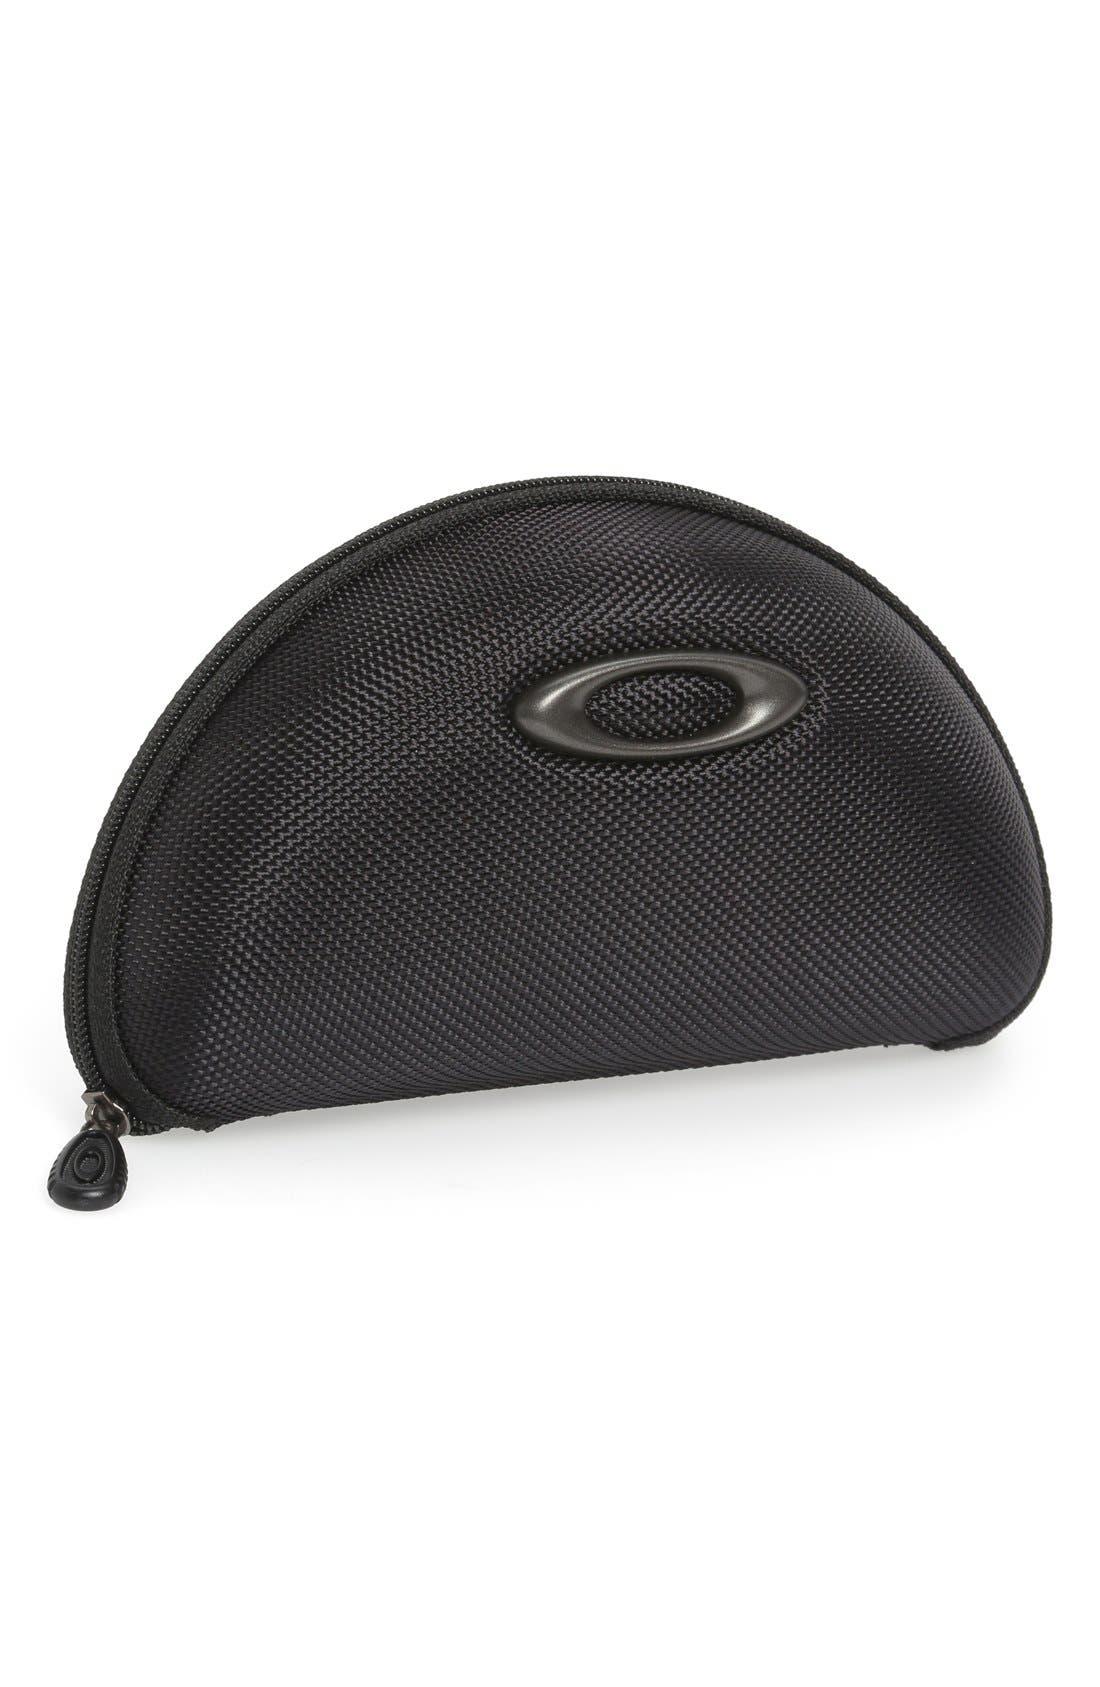 Alternate Image 1 Selected - Oakley 'Medium Soft Vault' Reinforced Nylon Sunglasses Case